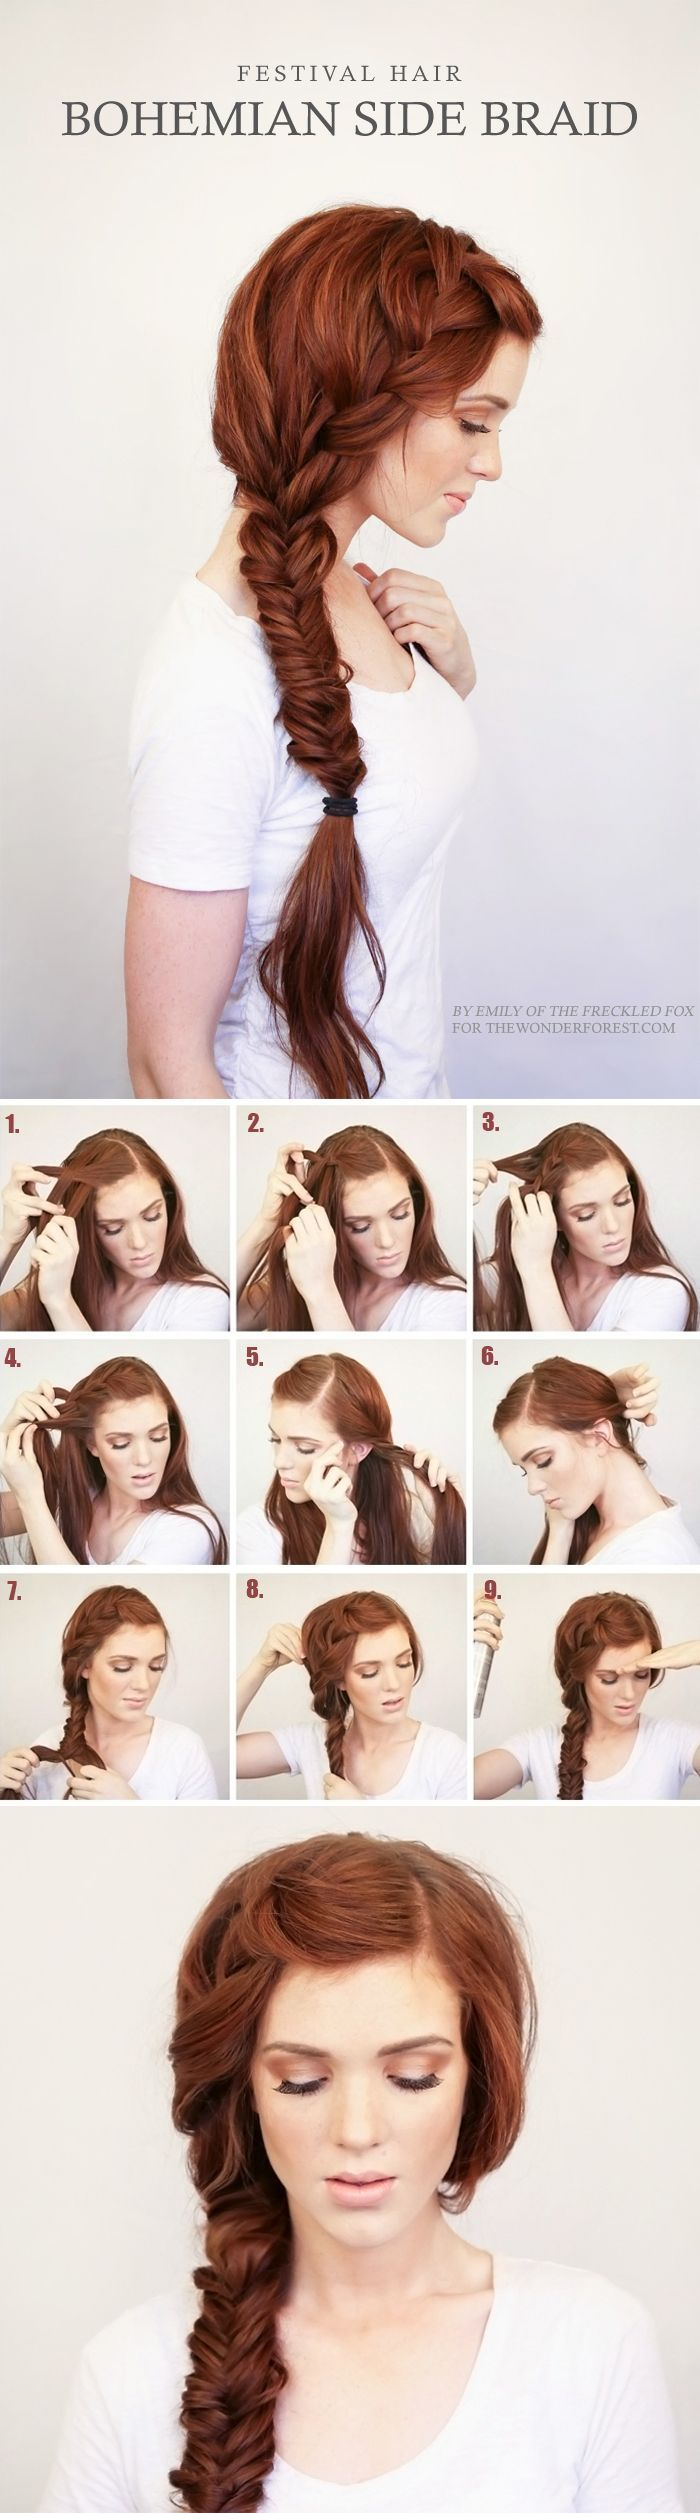 10 Best DIY Wedding Hairstyles with Tutorials | Tulle & Chantilly Wedding Blog